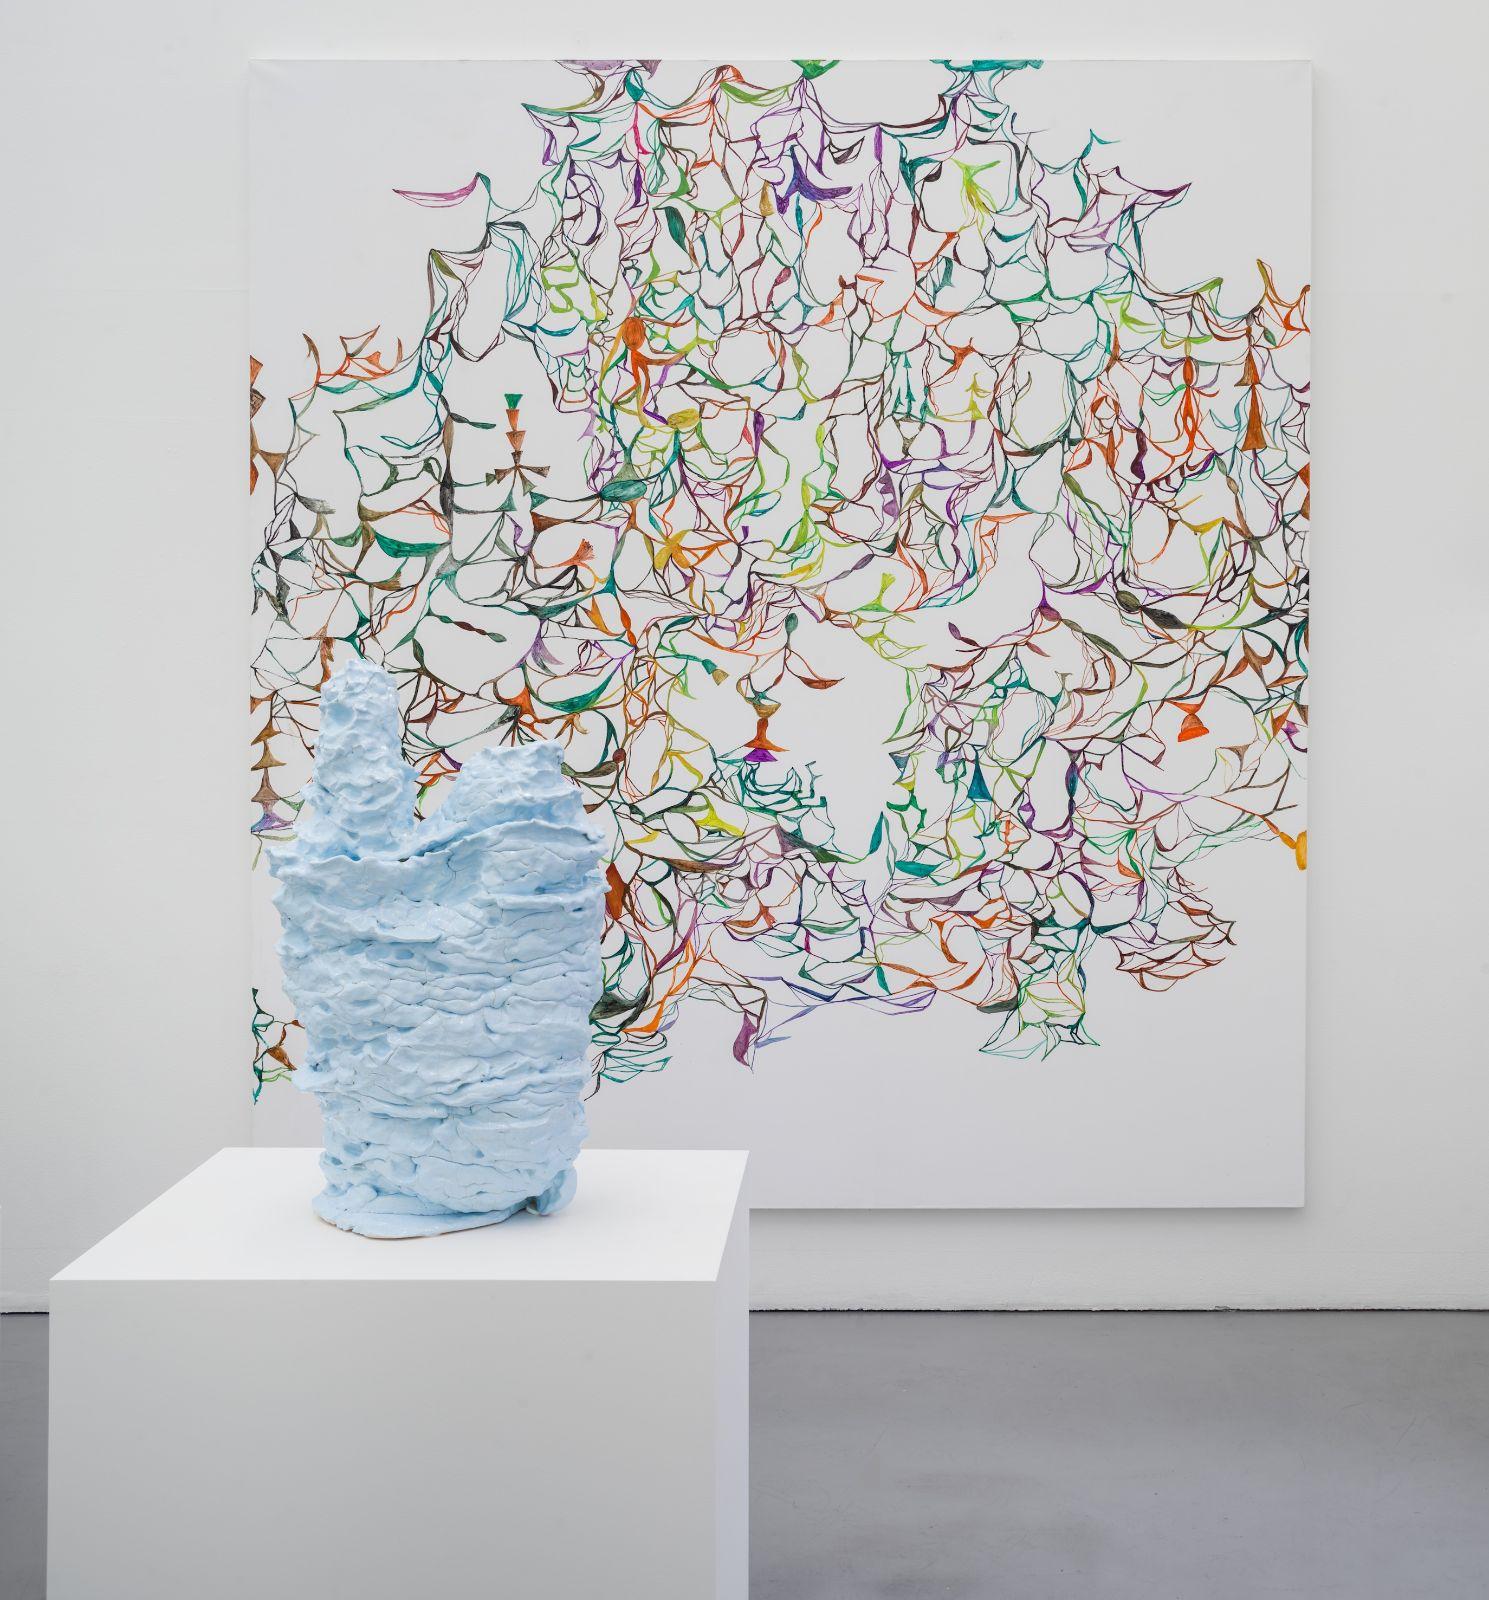 The Colibri Paintings No. 01, 2015, oil on canvas, 283 x 259 cm, The Libertines No. 02, 2014, glazed ceramics, 86 cm